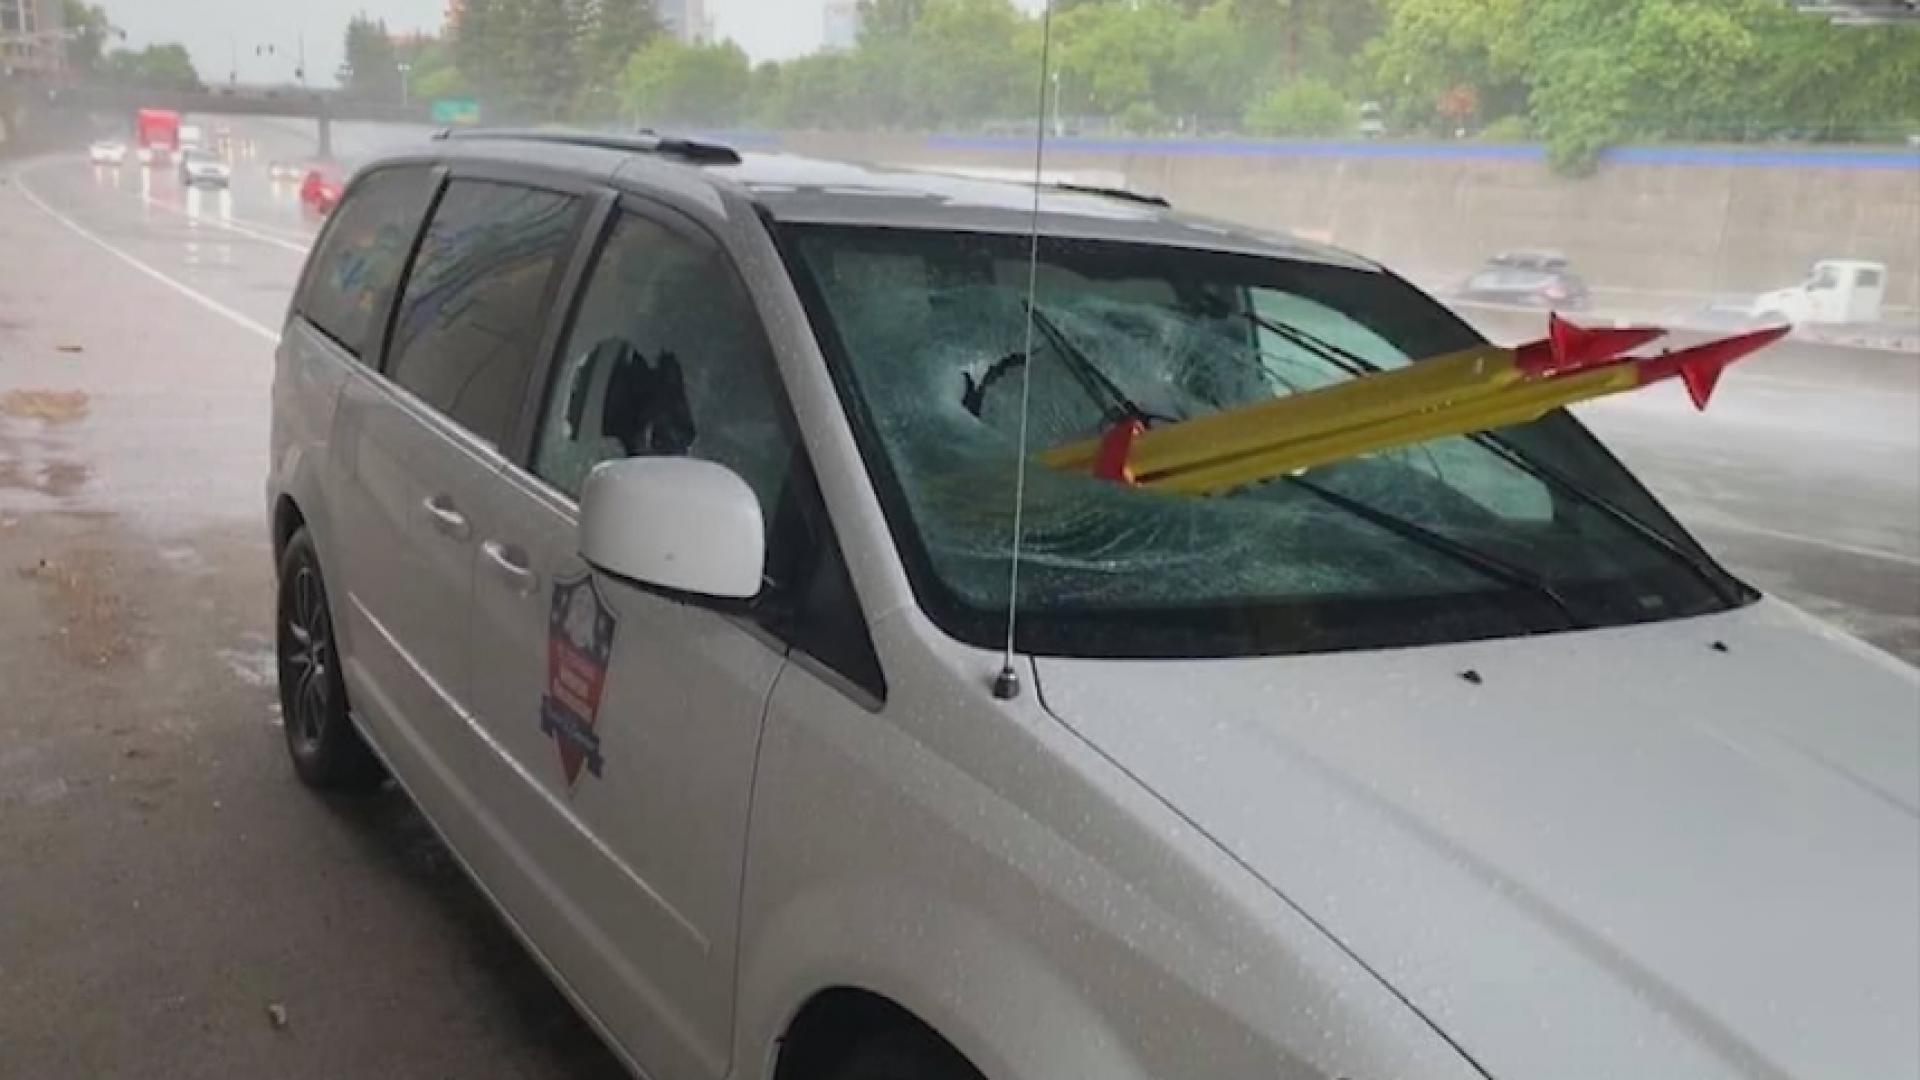 Tripod impales windshield of van in California